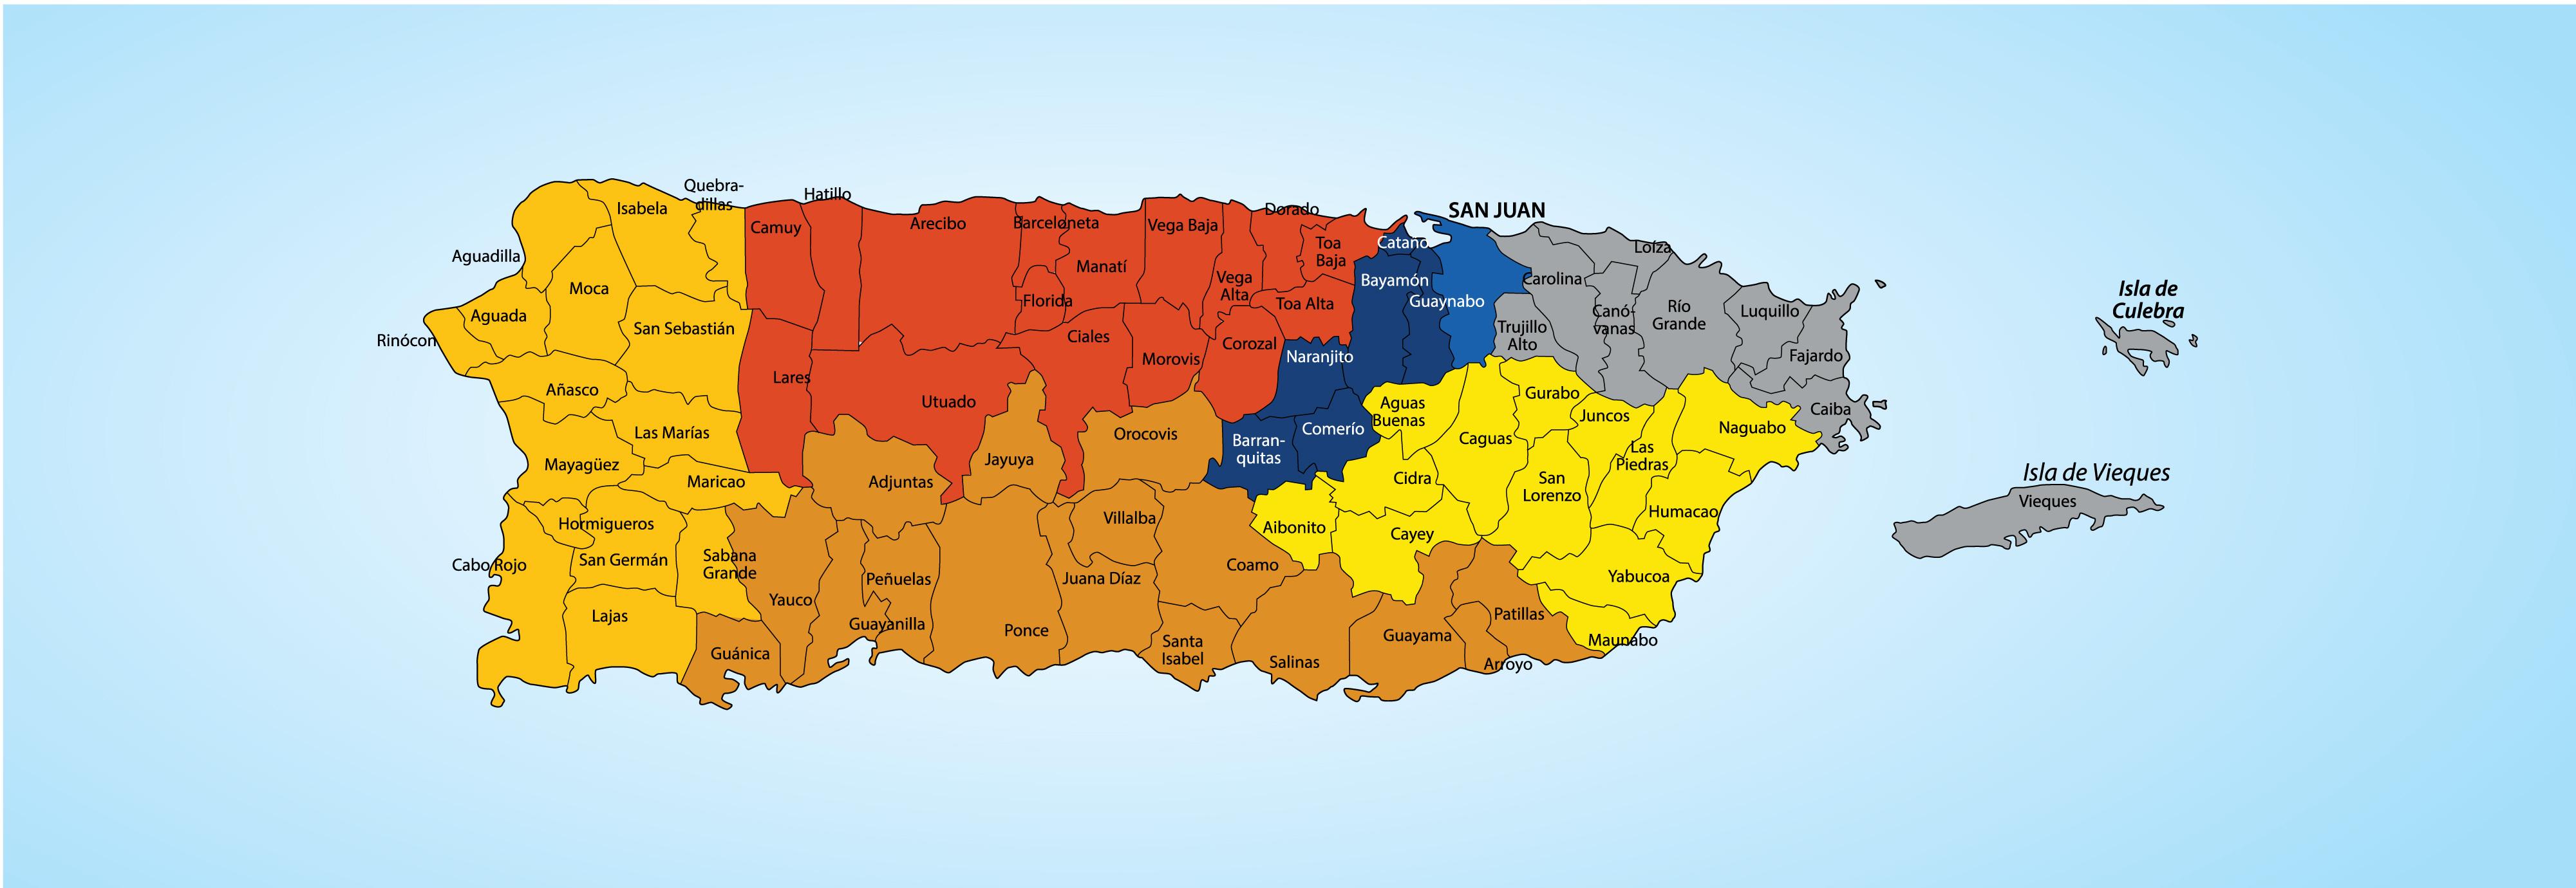 mapa_revisado 1